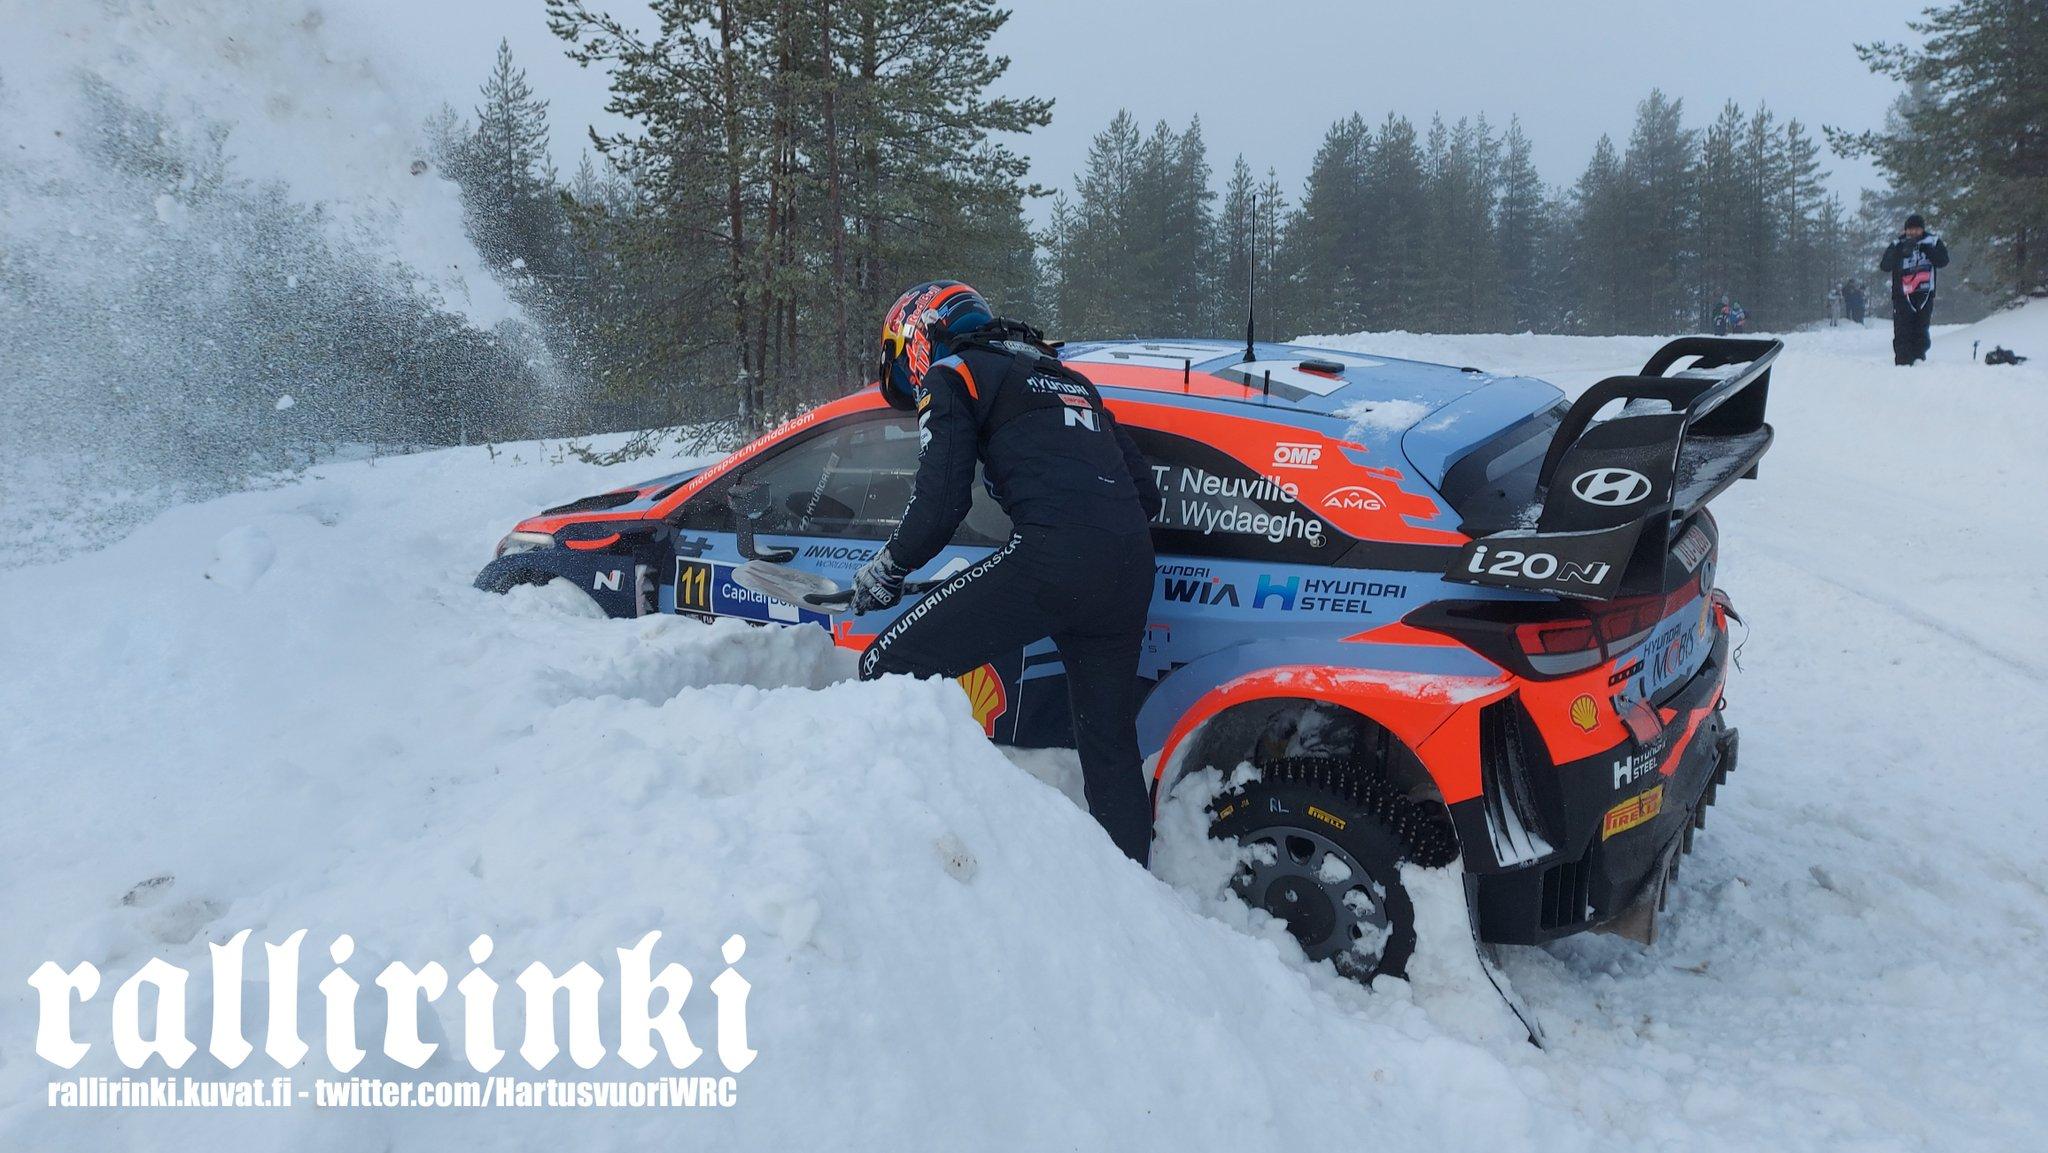 WRC: Arctic Rally Finland - Powered by CapitalBox [26-28 Febrero] - Página 2 EvIwwI2XEAANqdG?format=jpg&name=large